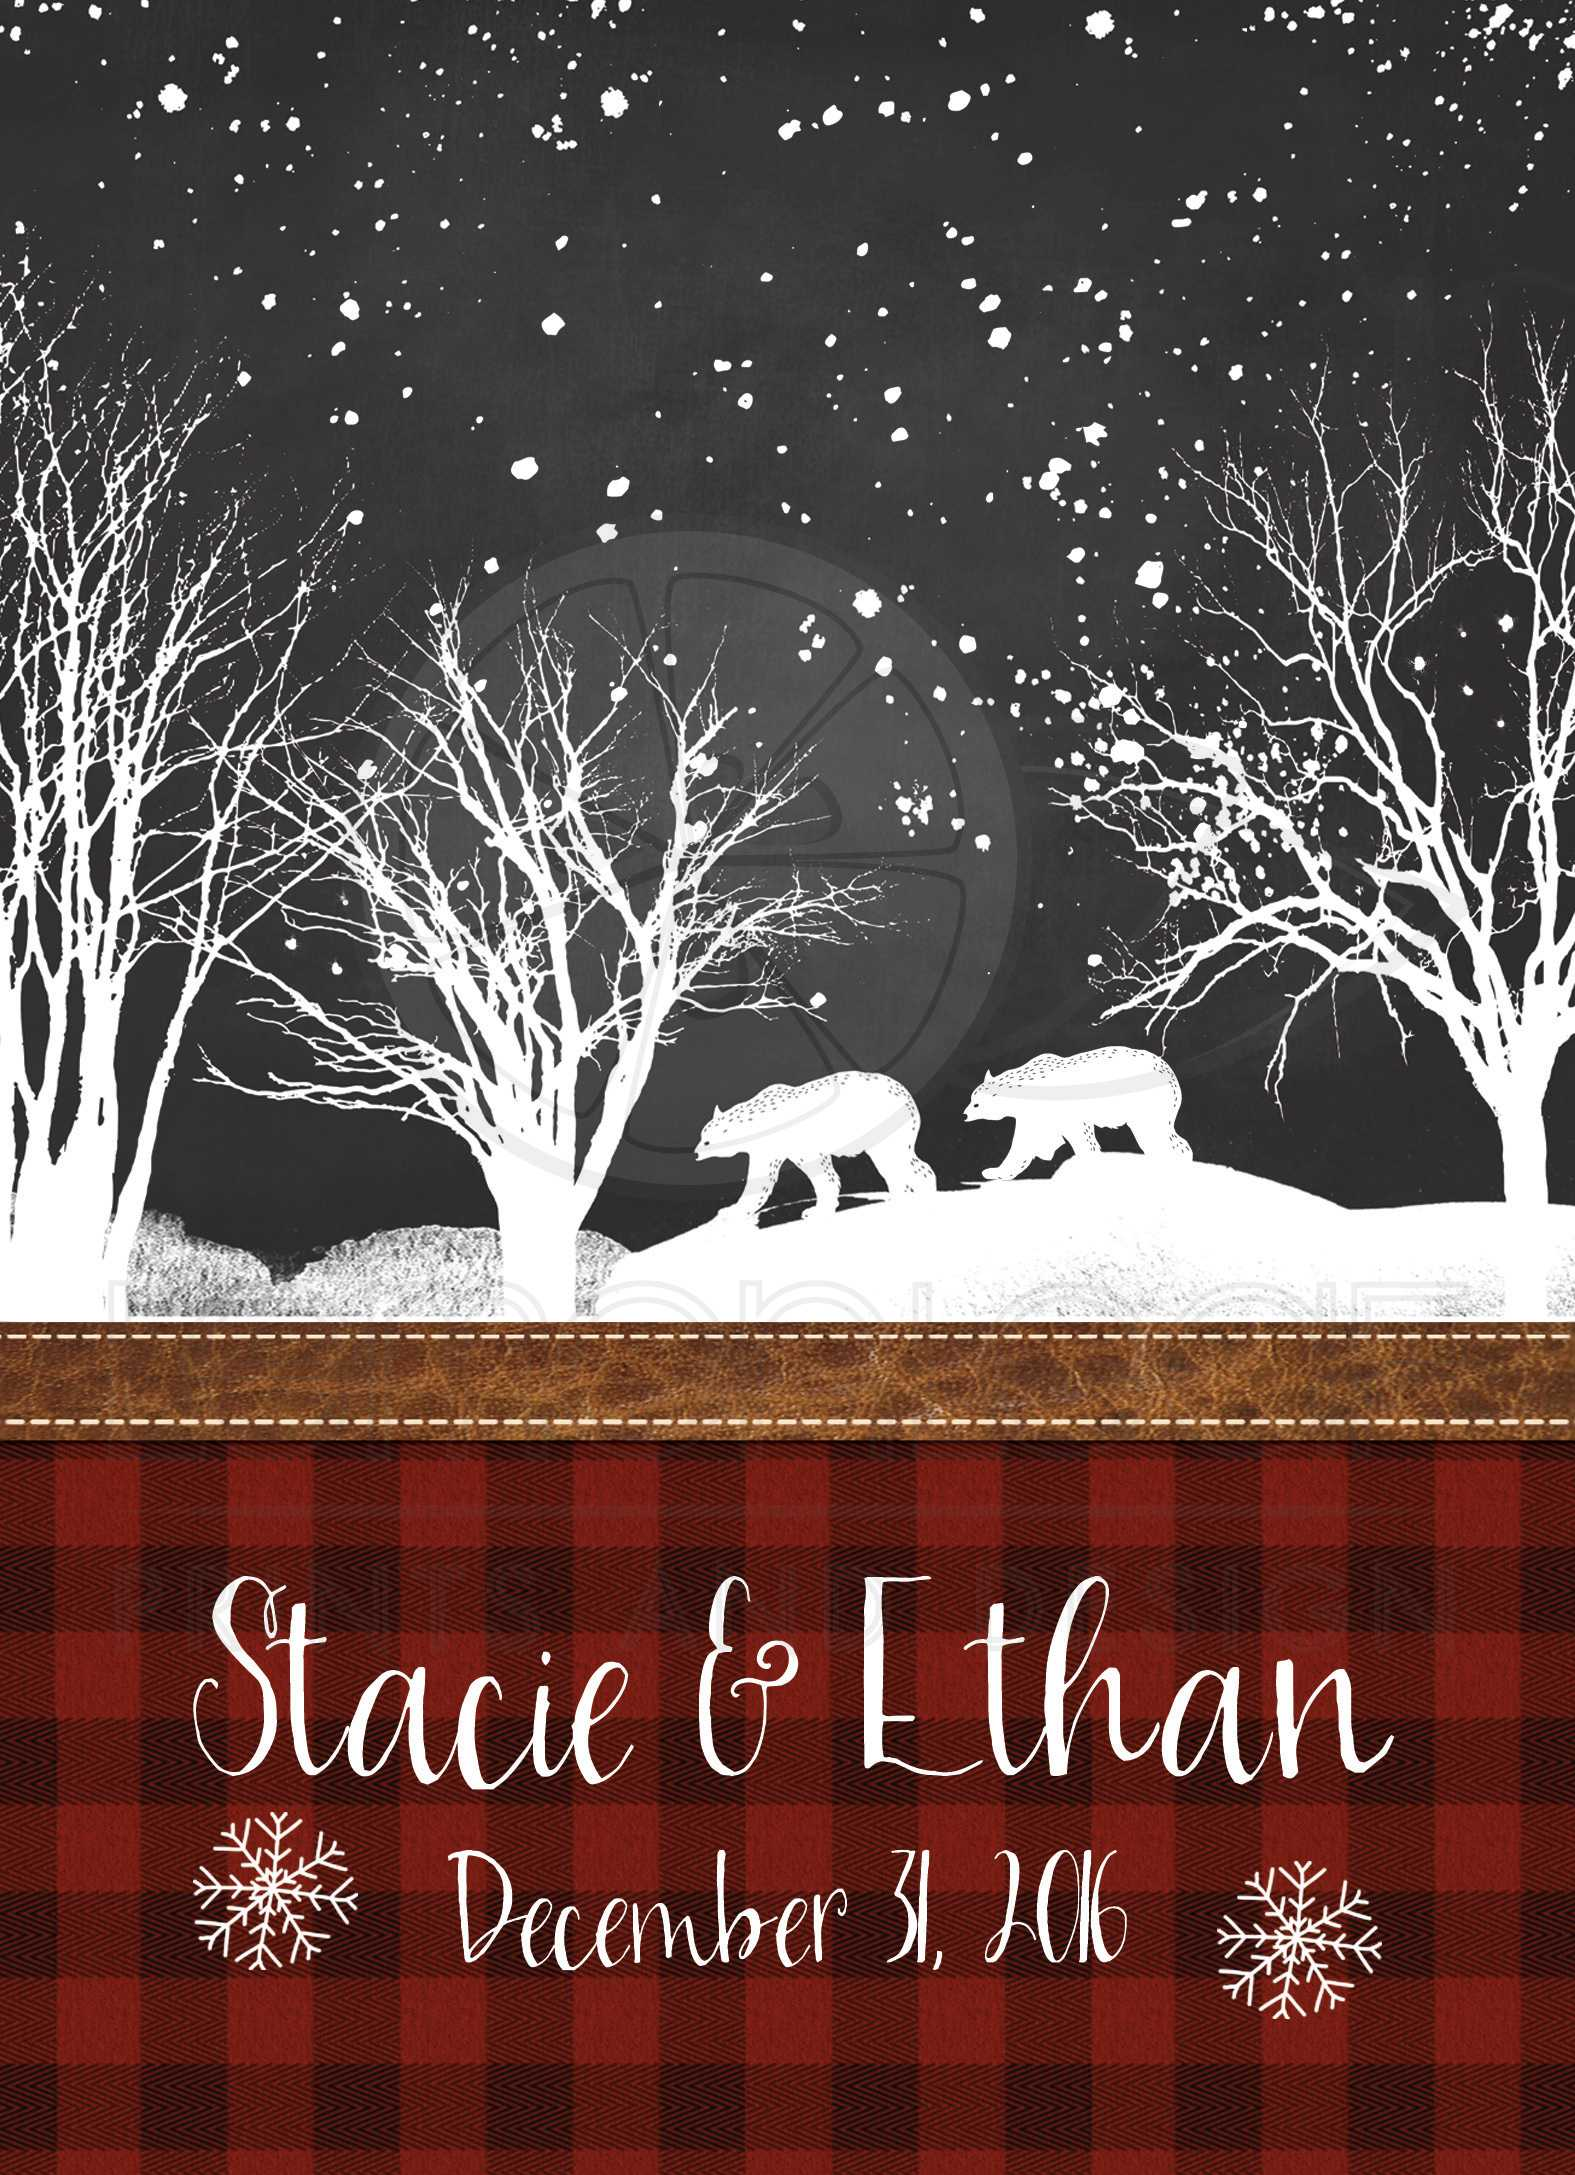 Wedding Invitation | Rustic Plaid, Winter Woods, Bears | Snow